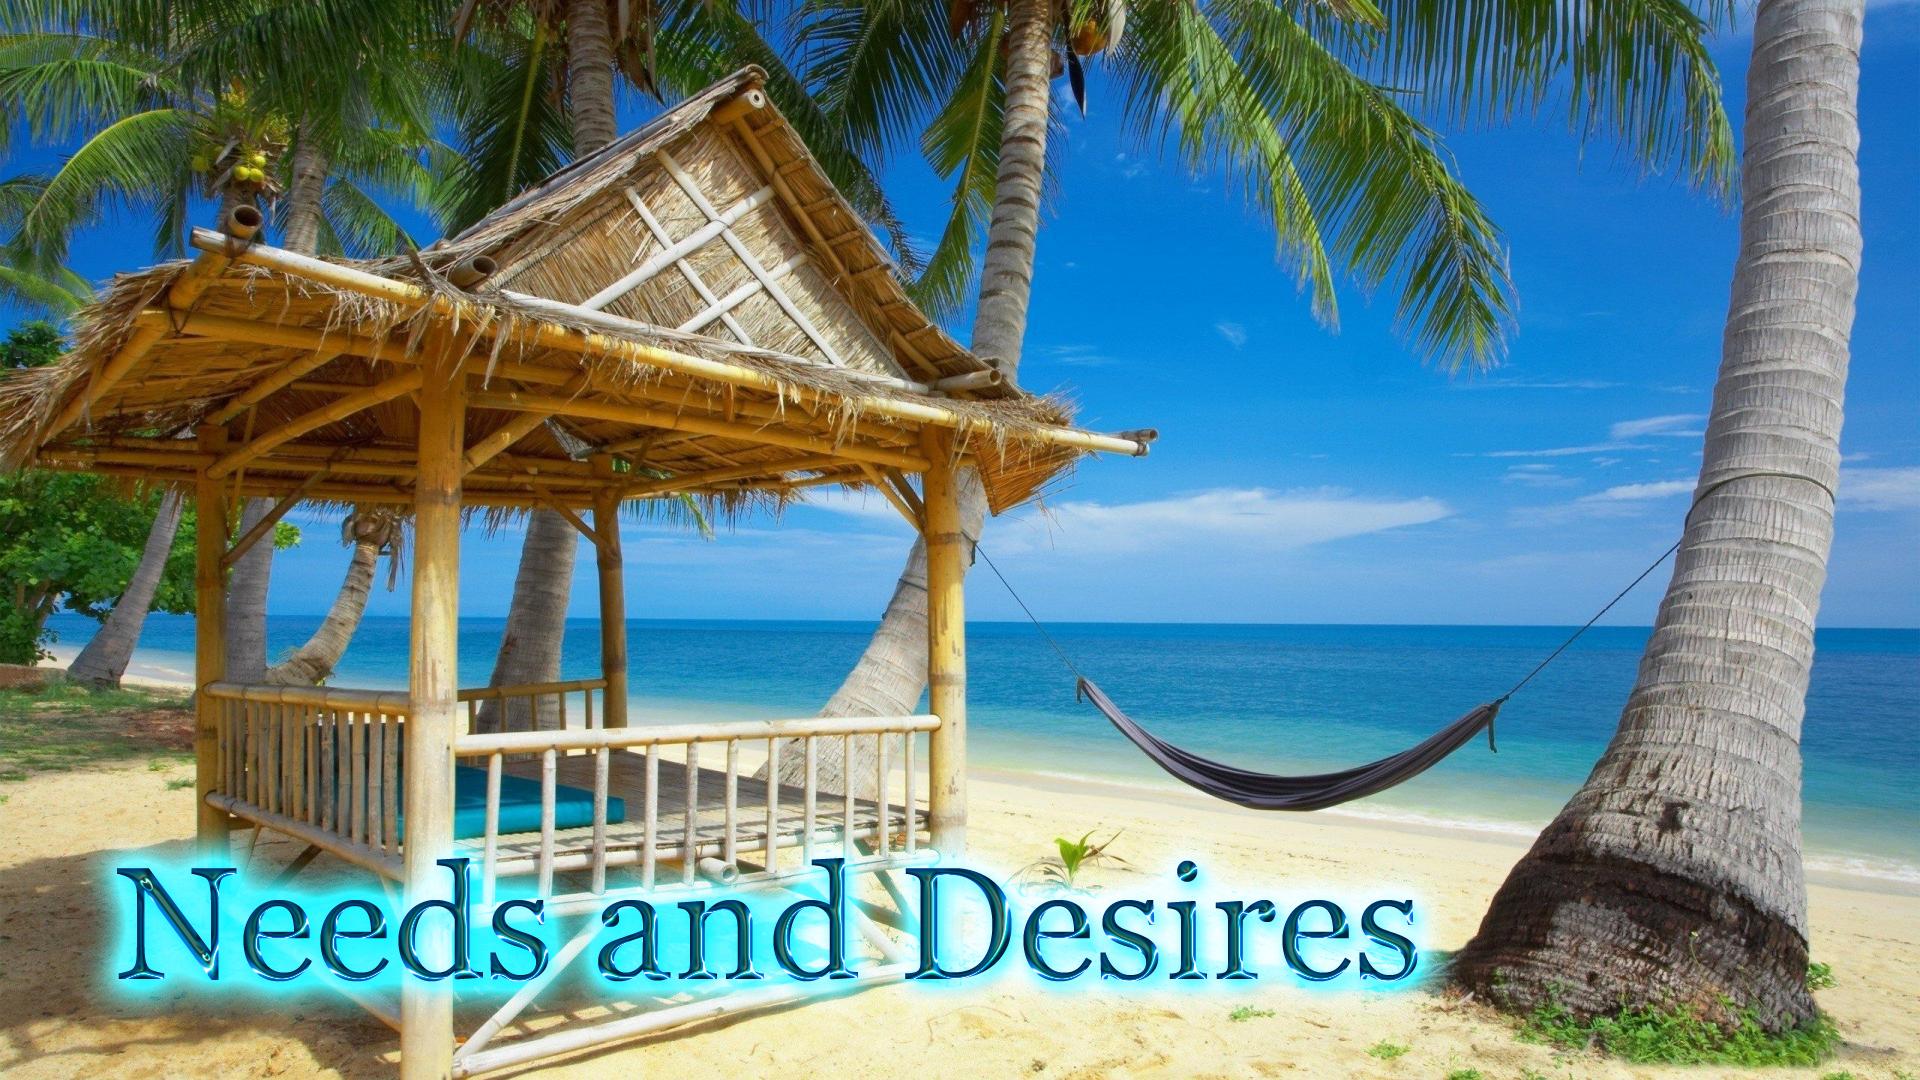 needs-and-desires.jpg